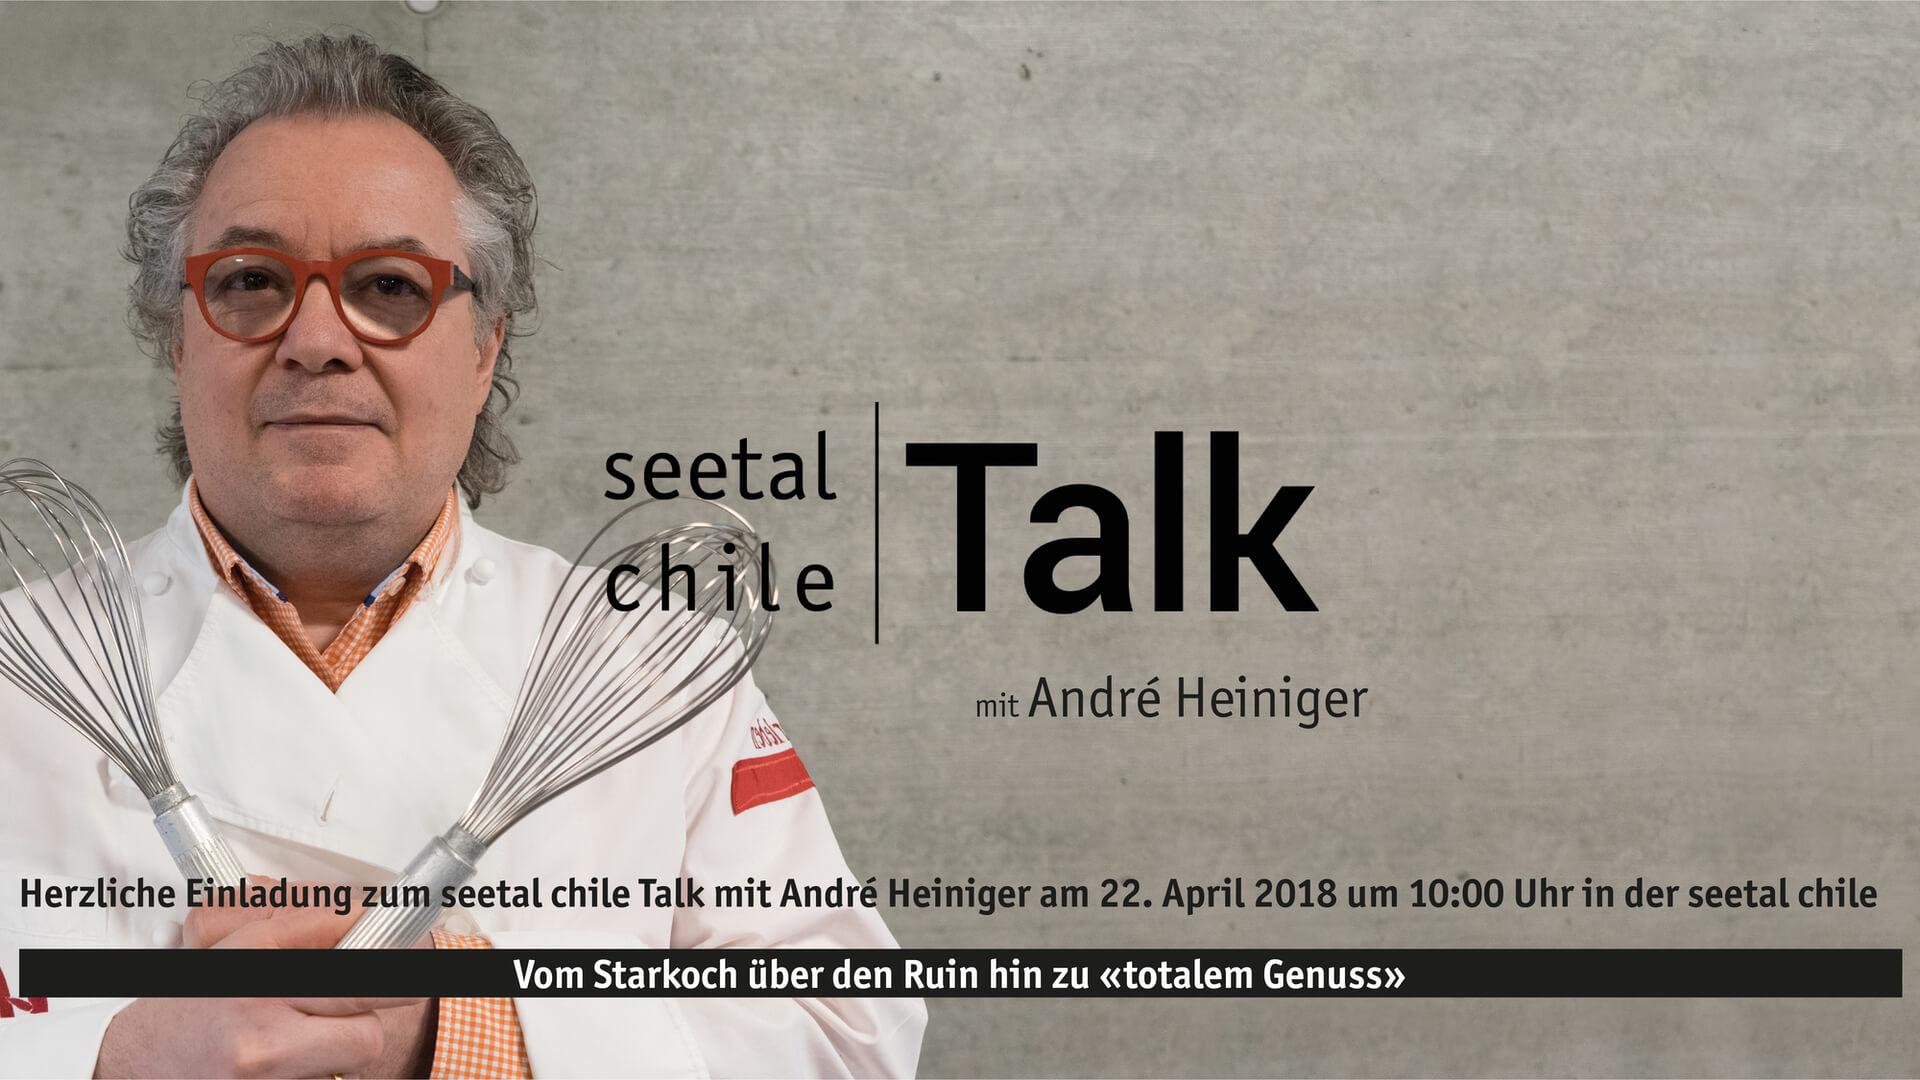 seetal chile Talk mit André Heiniger